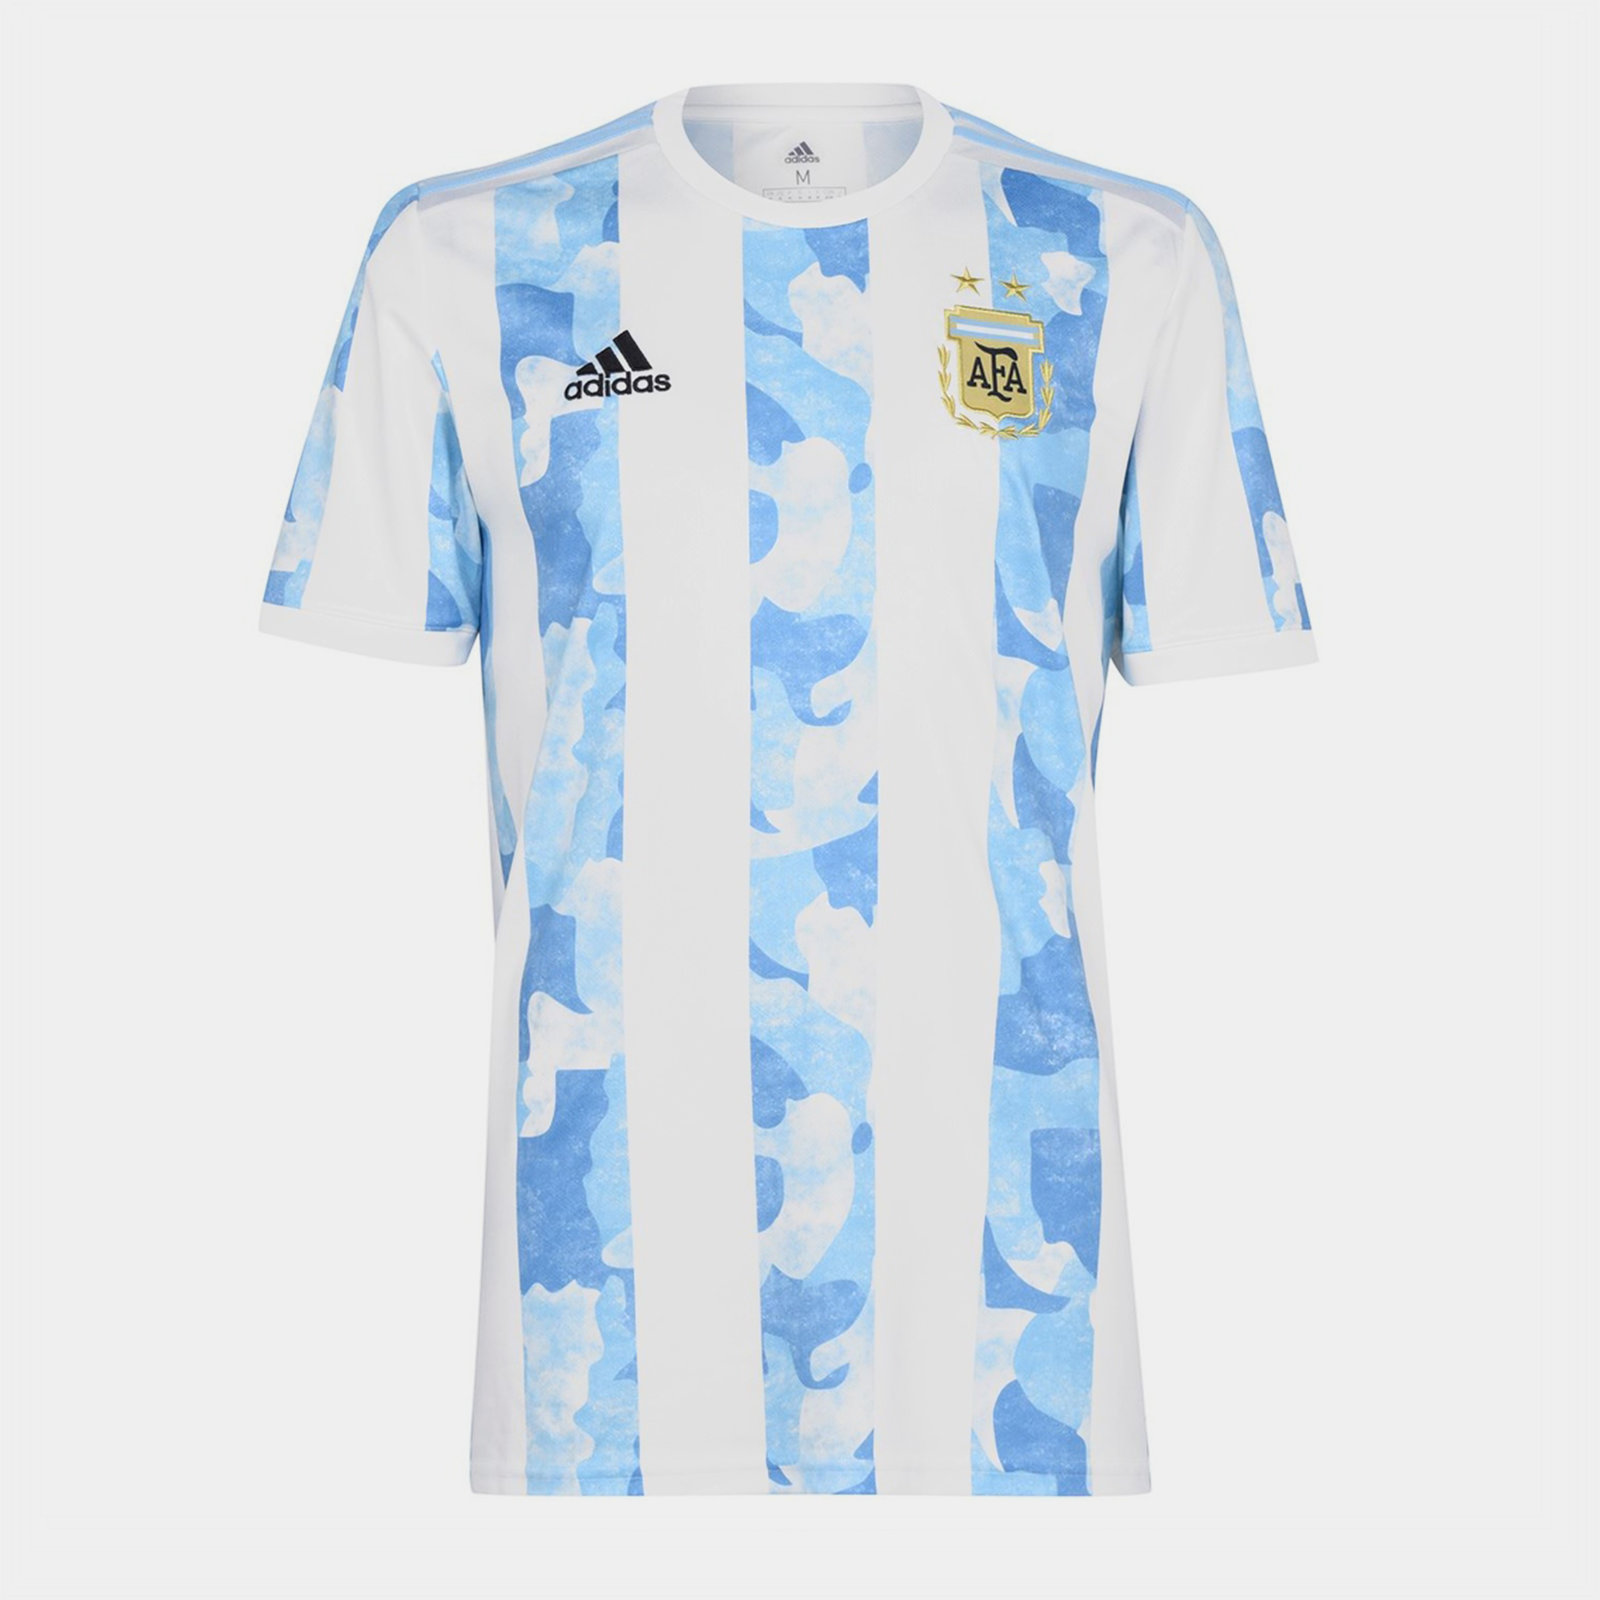 Argentina 2020 Home Football Shirt